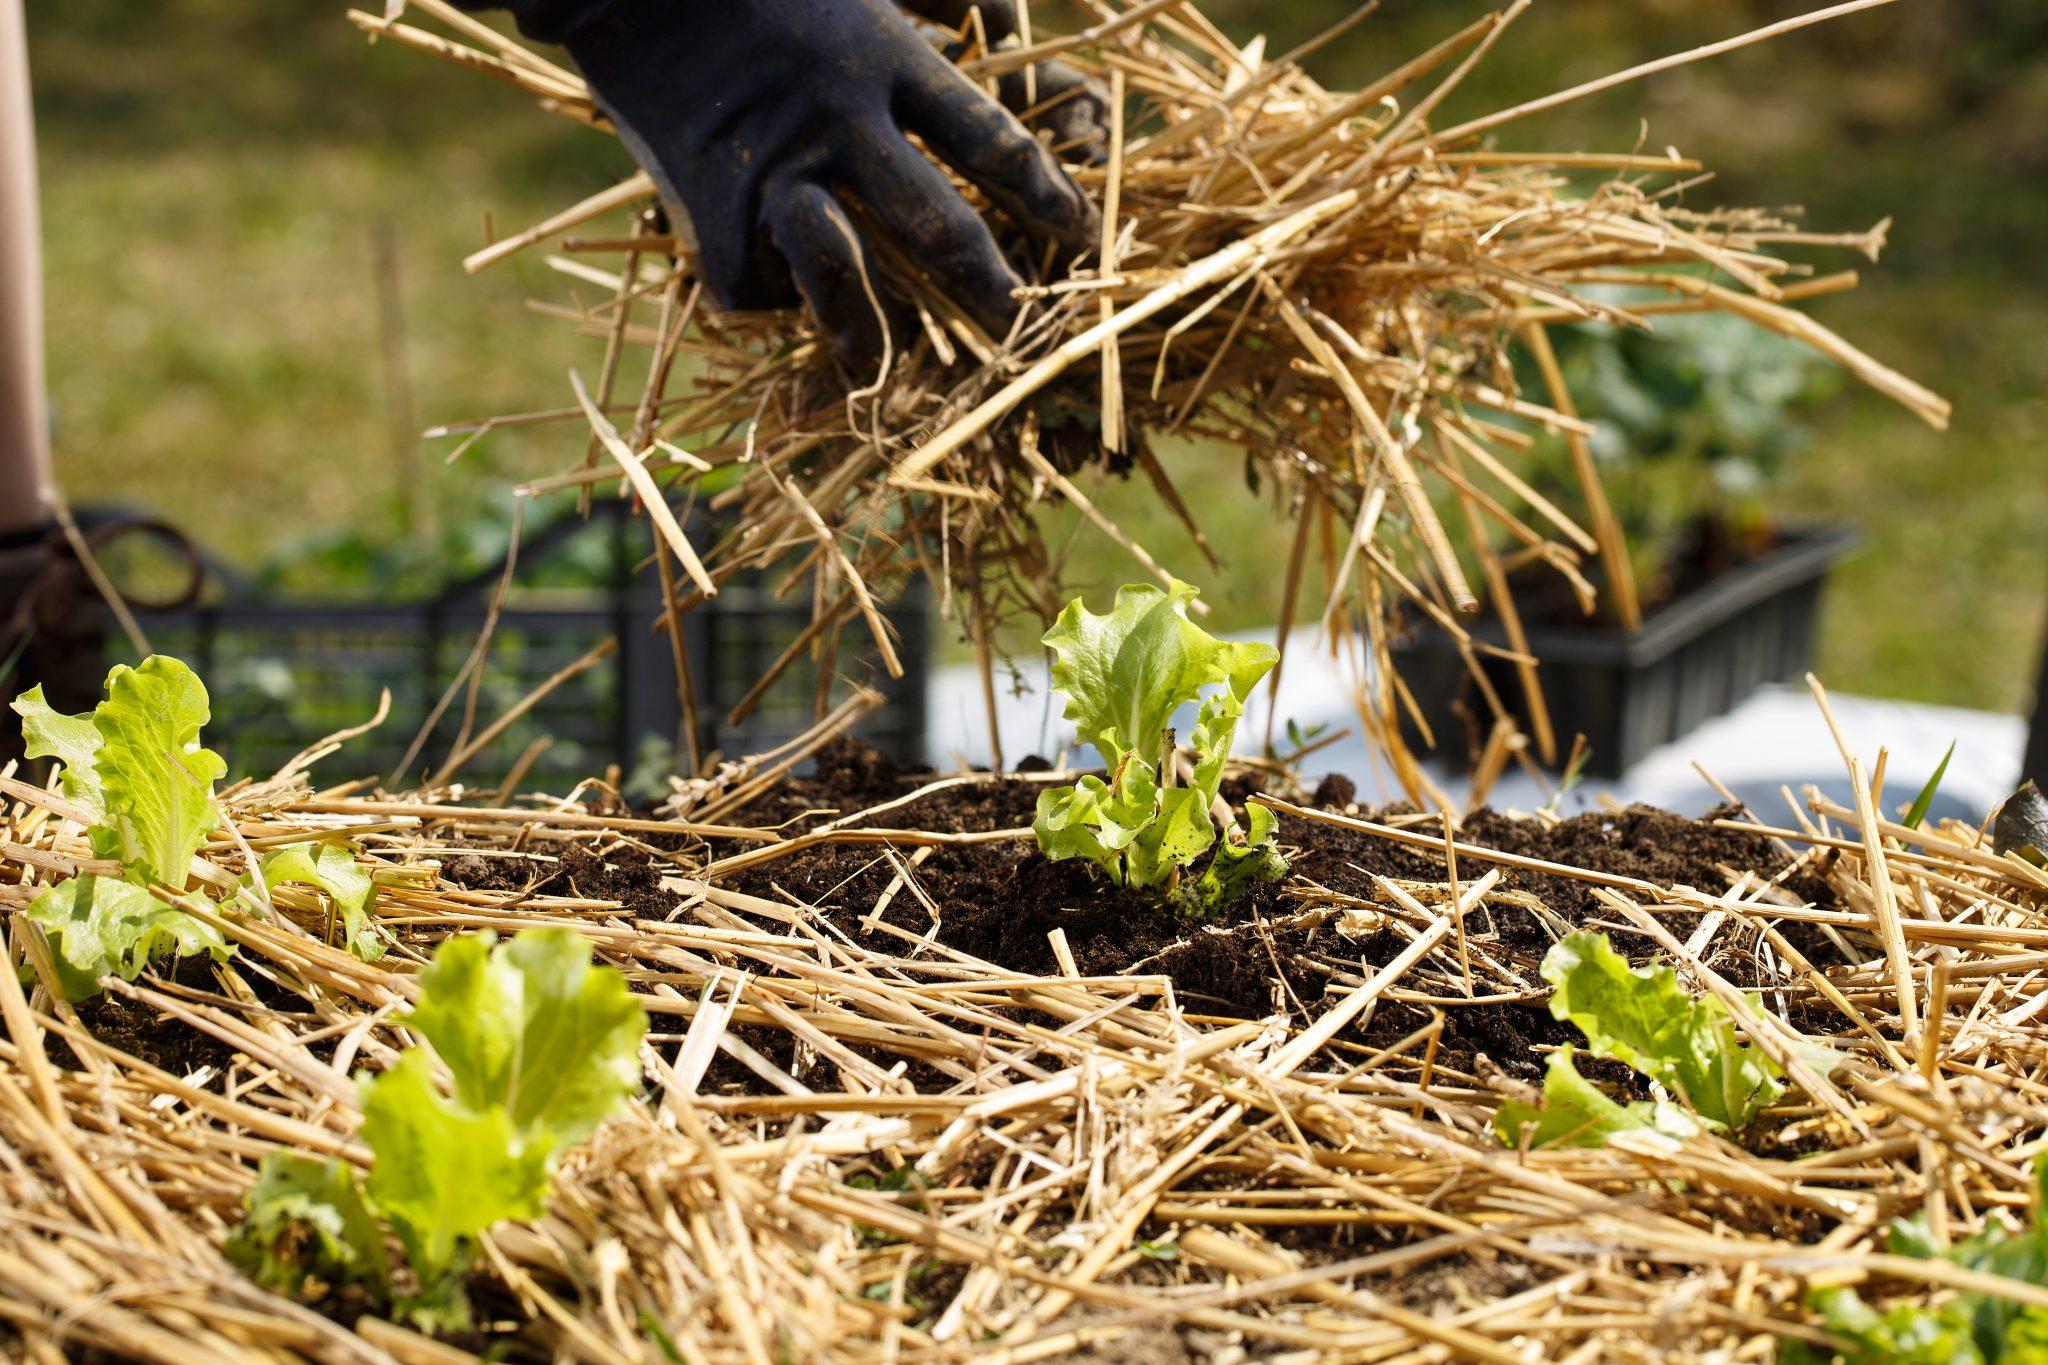 Mulching garden to reduce weeds